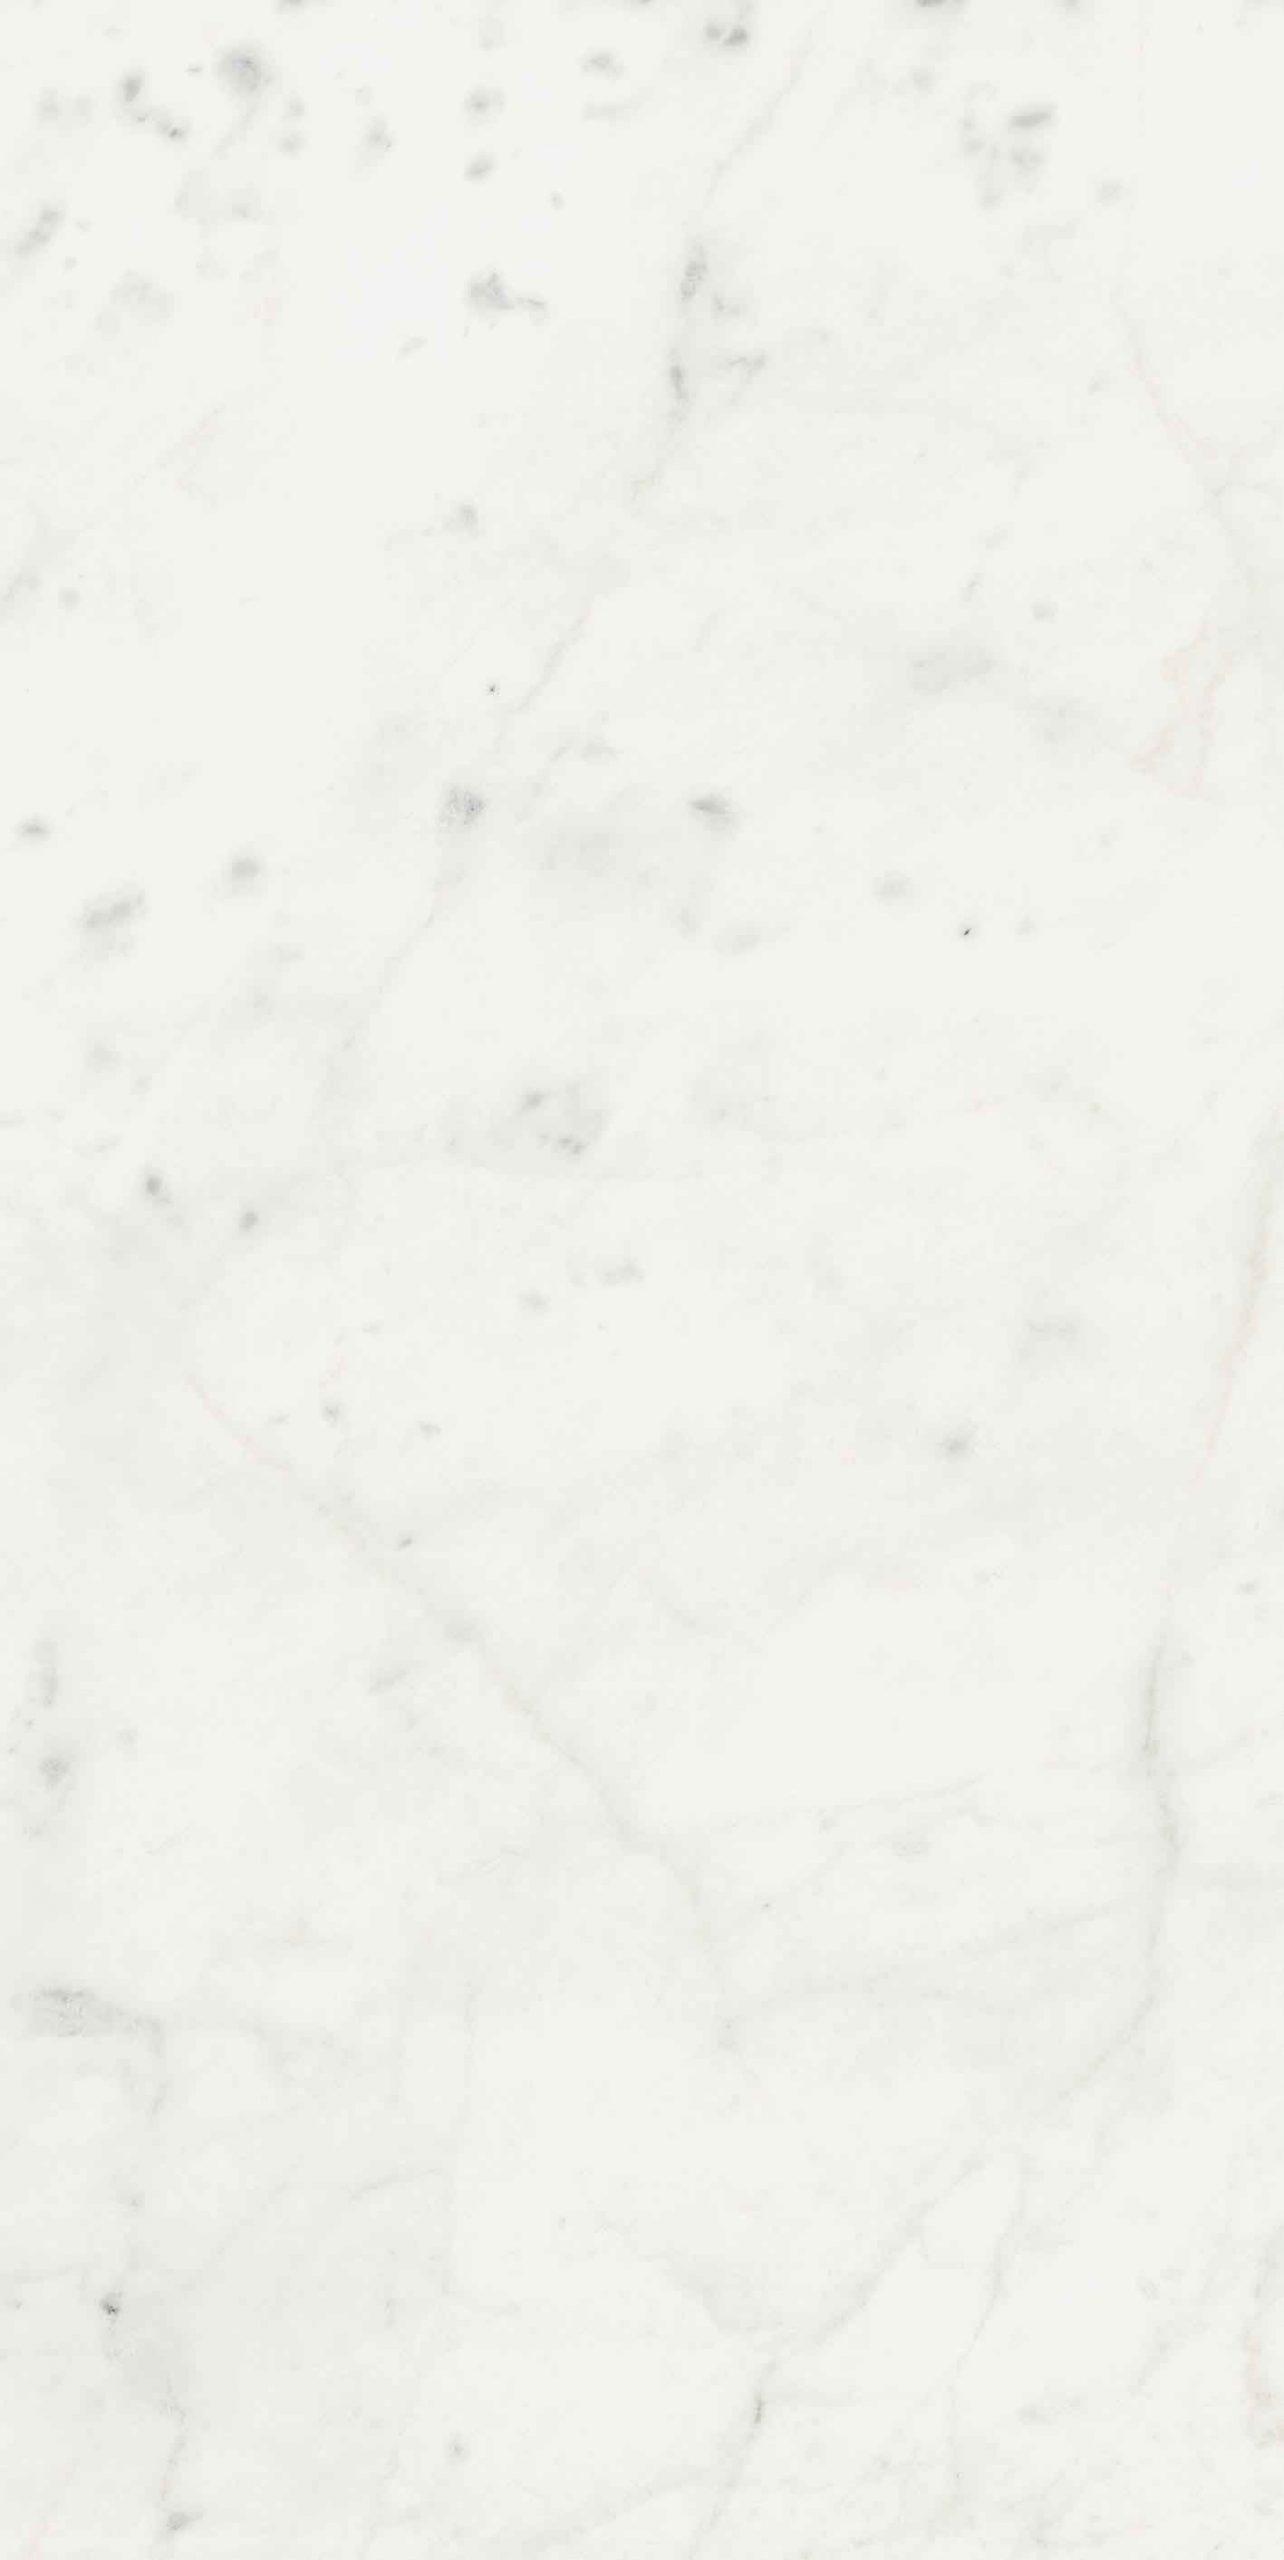 Stontech 4.0 Stone 01 Matte 10mm 60 x 120